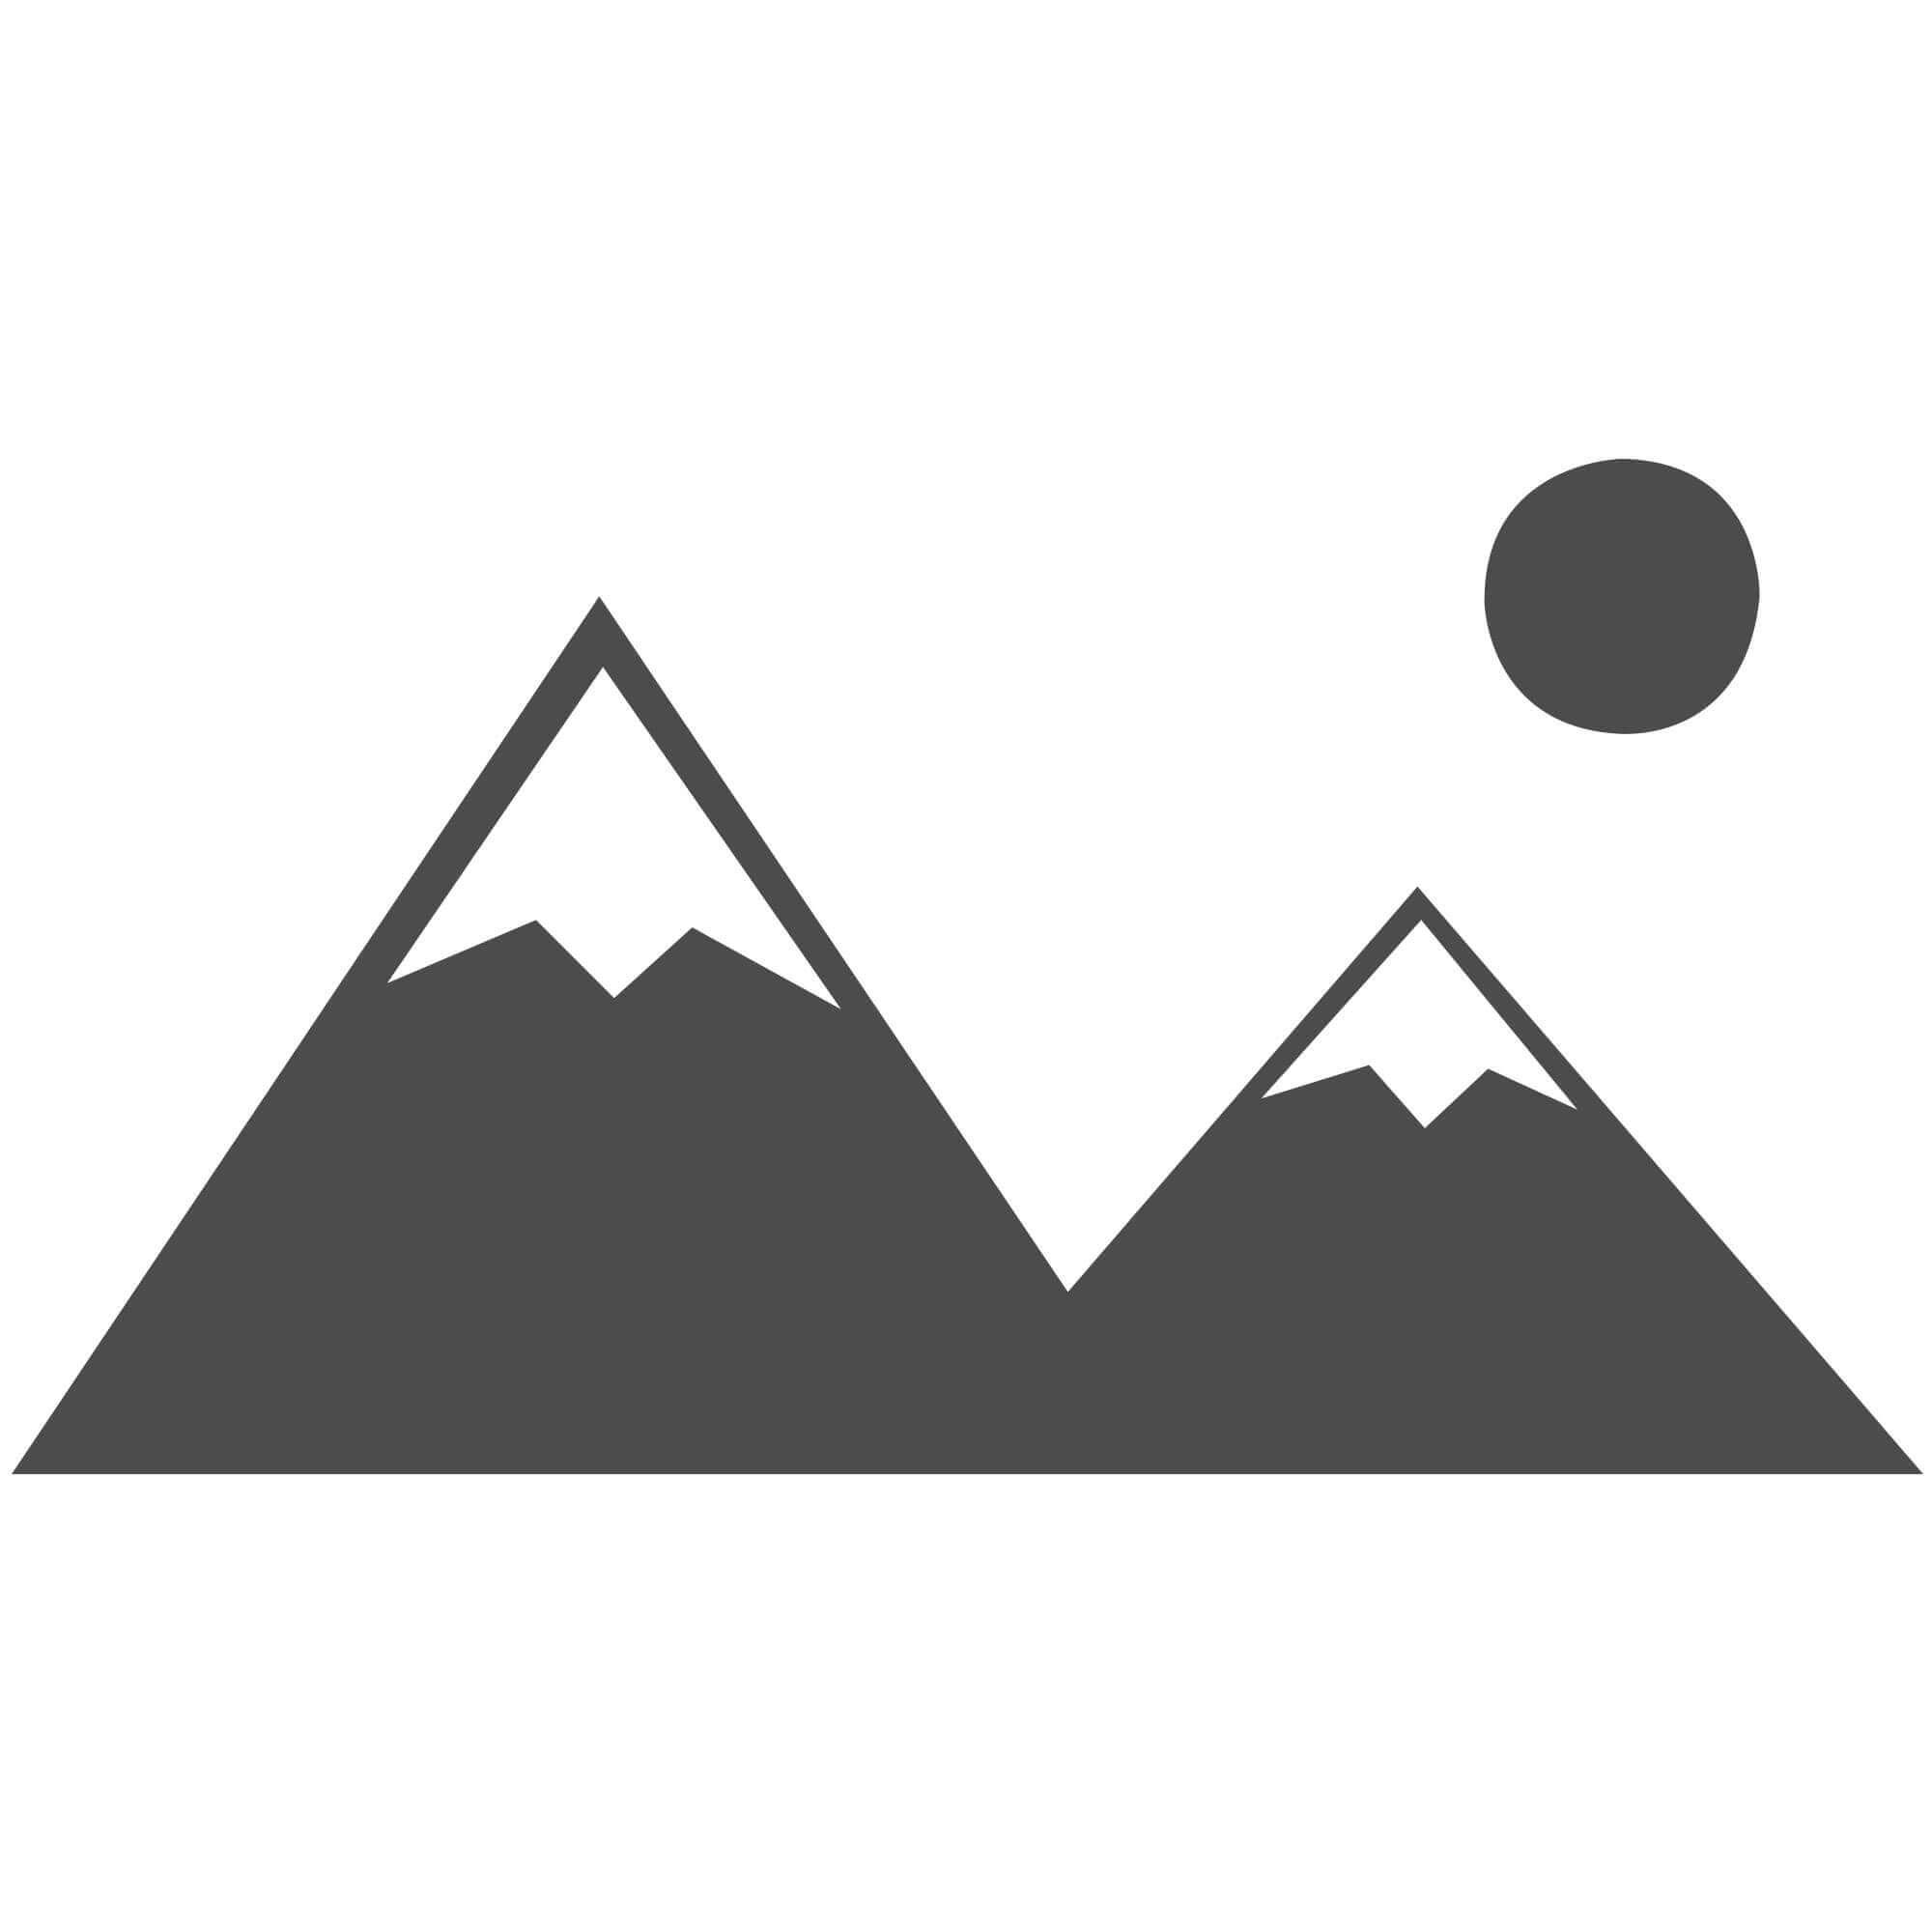 "Alhambra Traditional Rug - 6345c ivory/beige - Size 160 x 230 cm (5'3"" x 7'7"")"